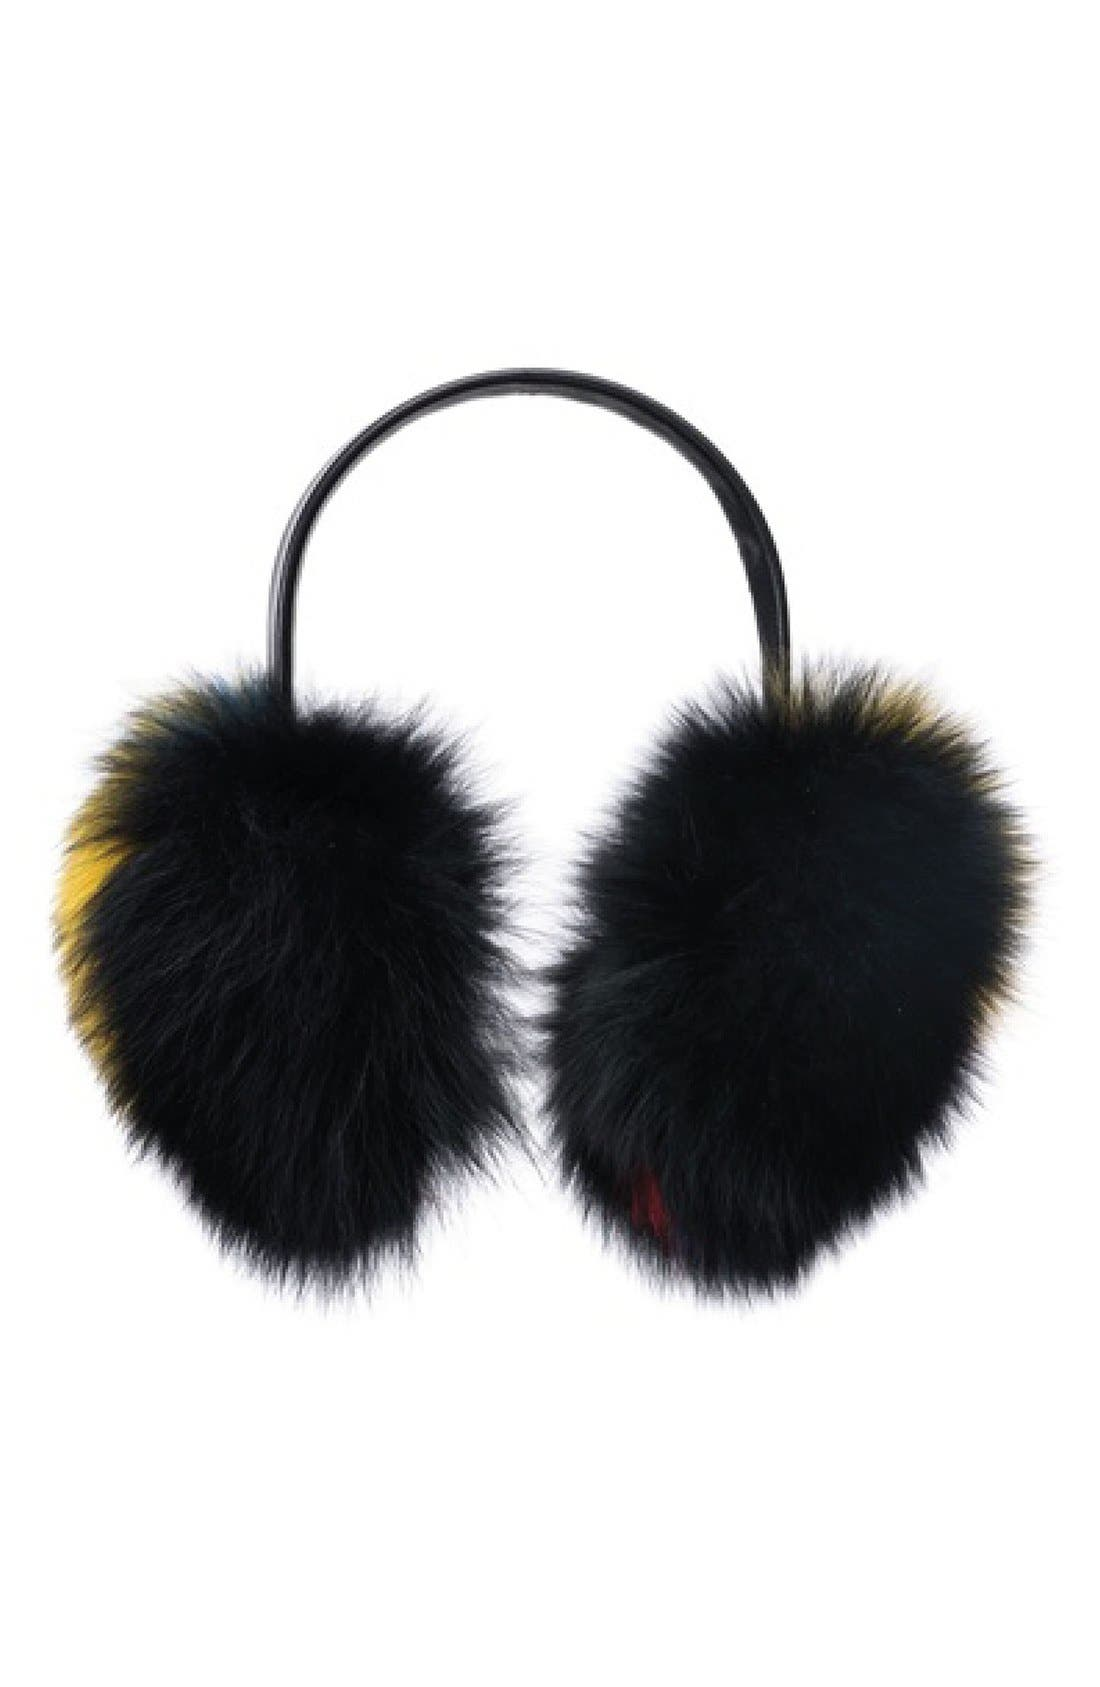 Main Image - Eugenia Kim 'Janine' Genuine Fox Fur Earmuffs